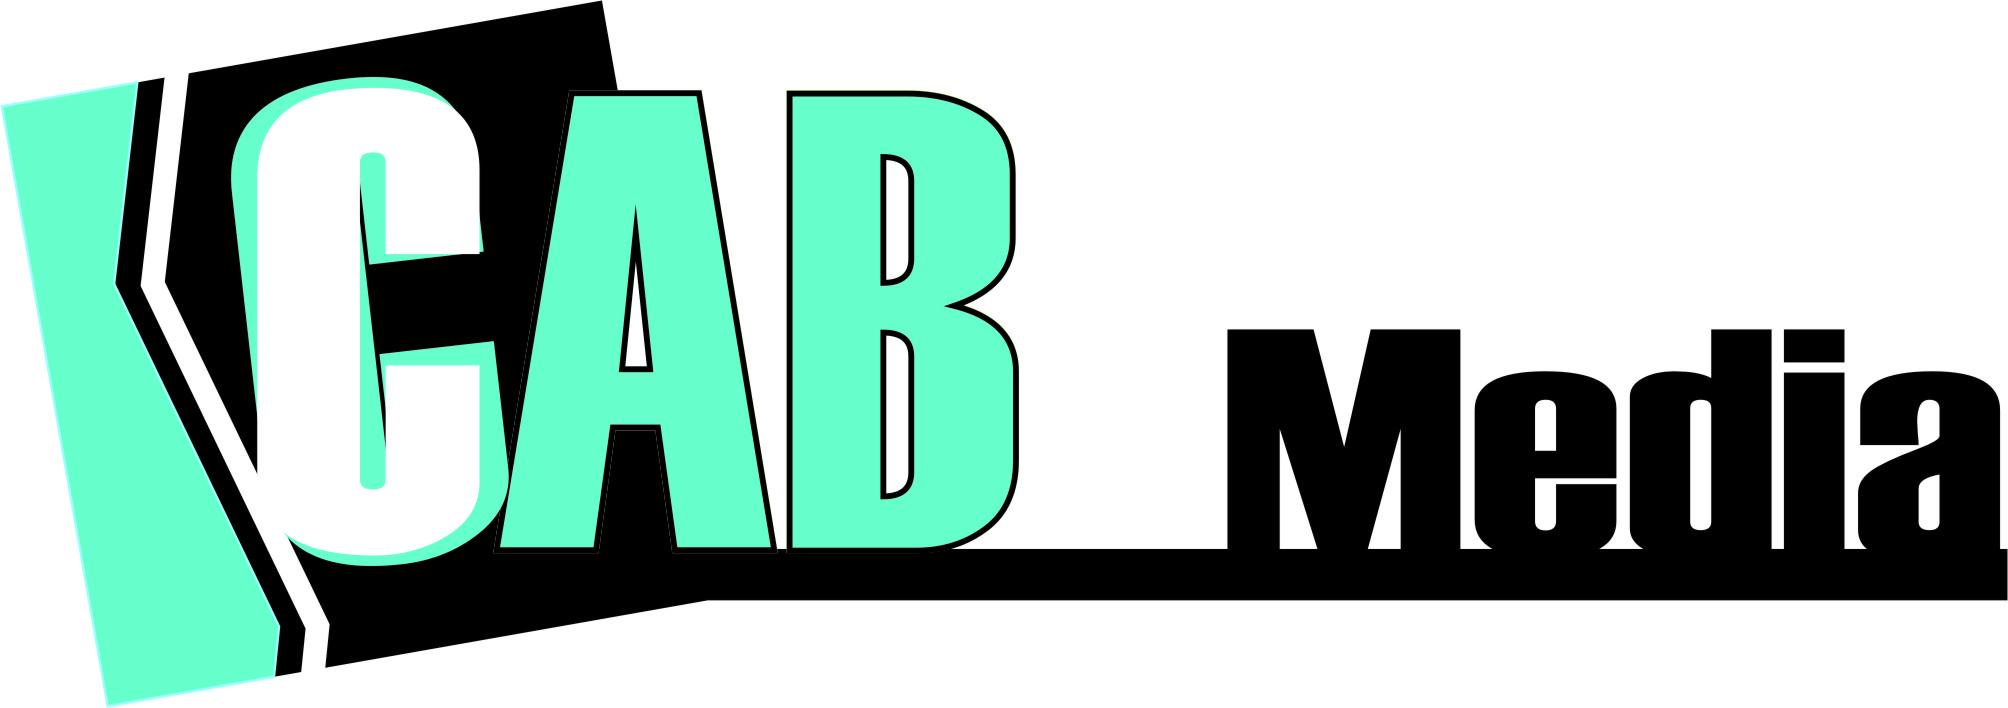 CAB media web